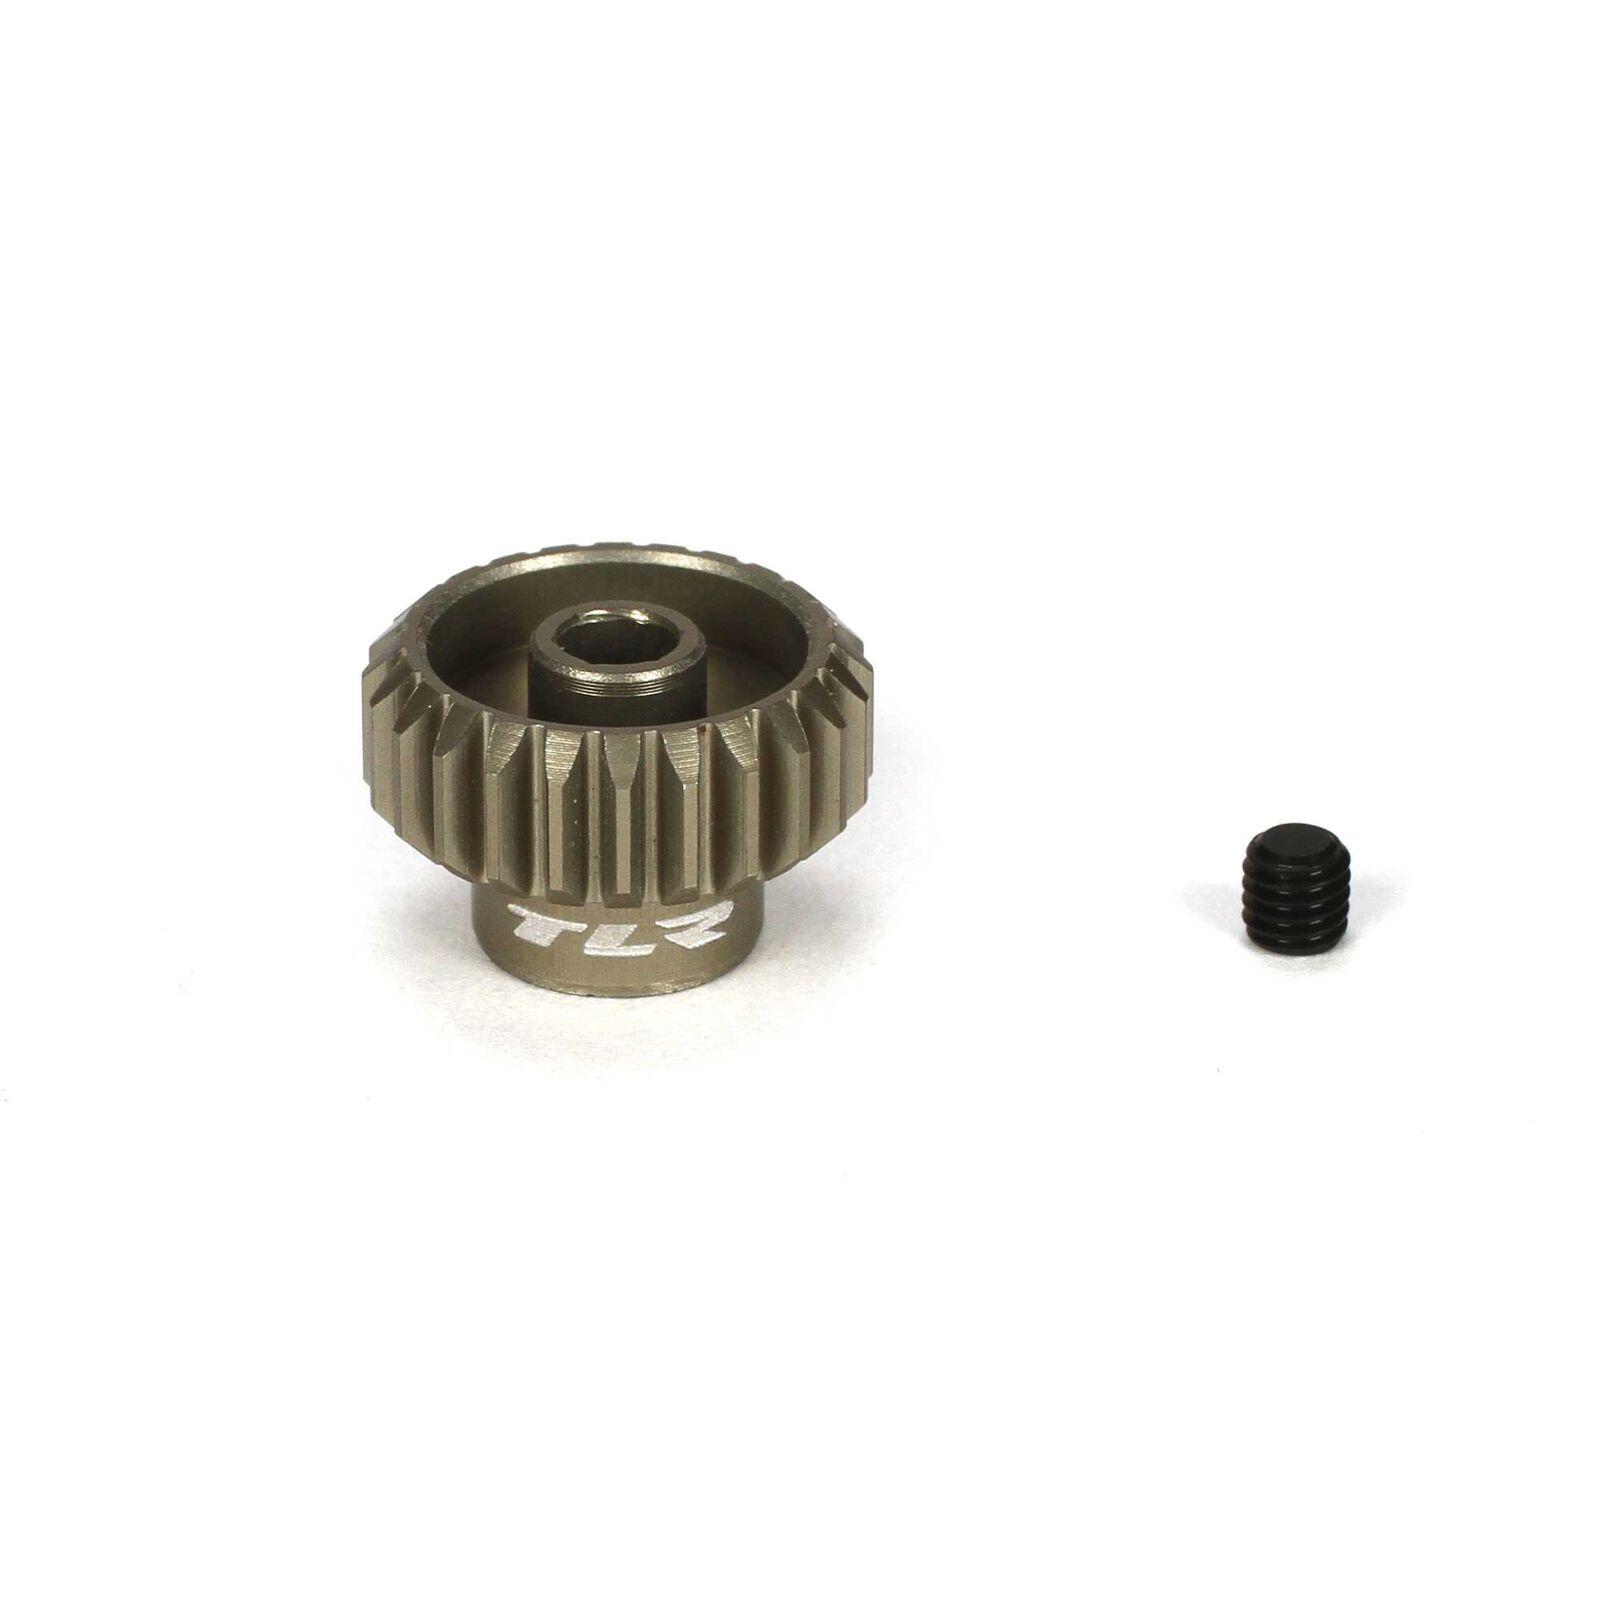 48P Aluminum Pinion Gear, 24T